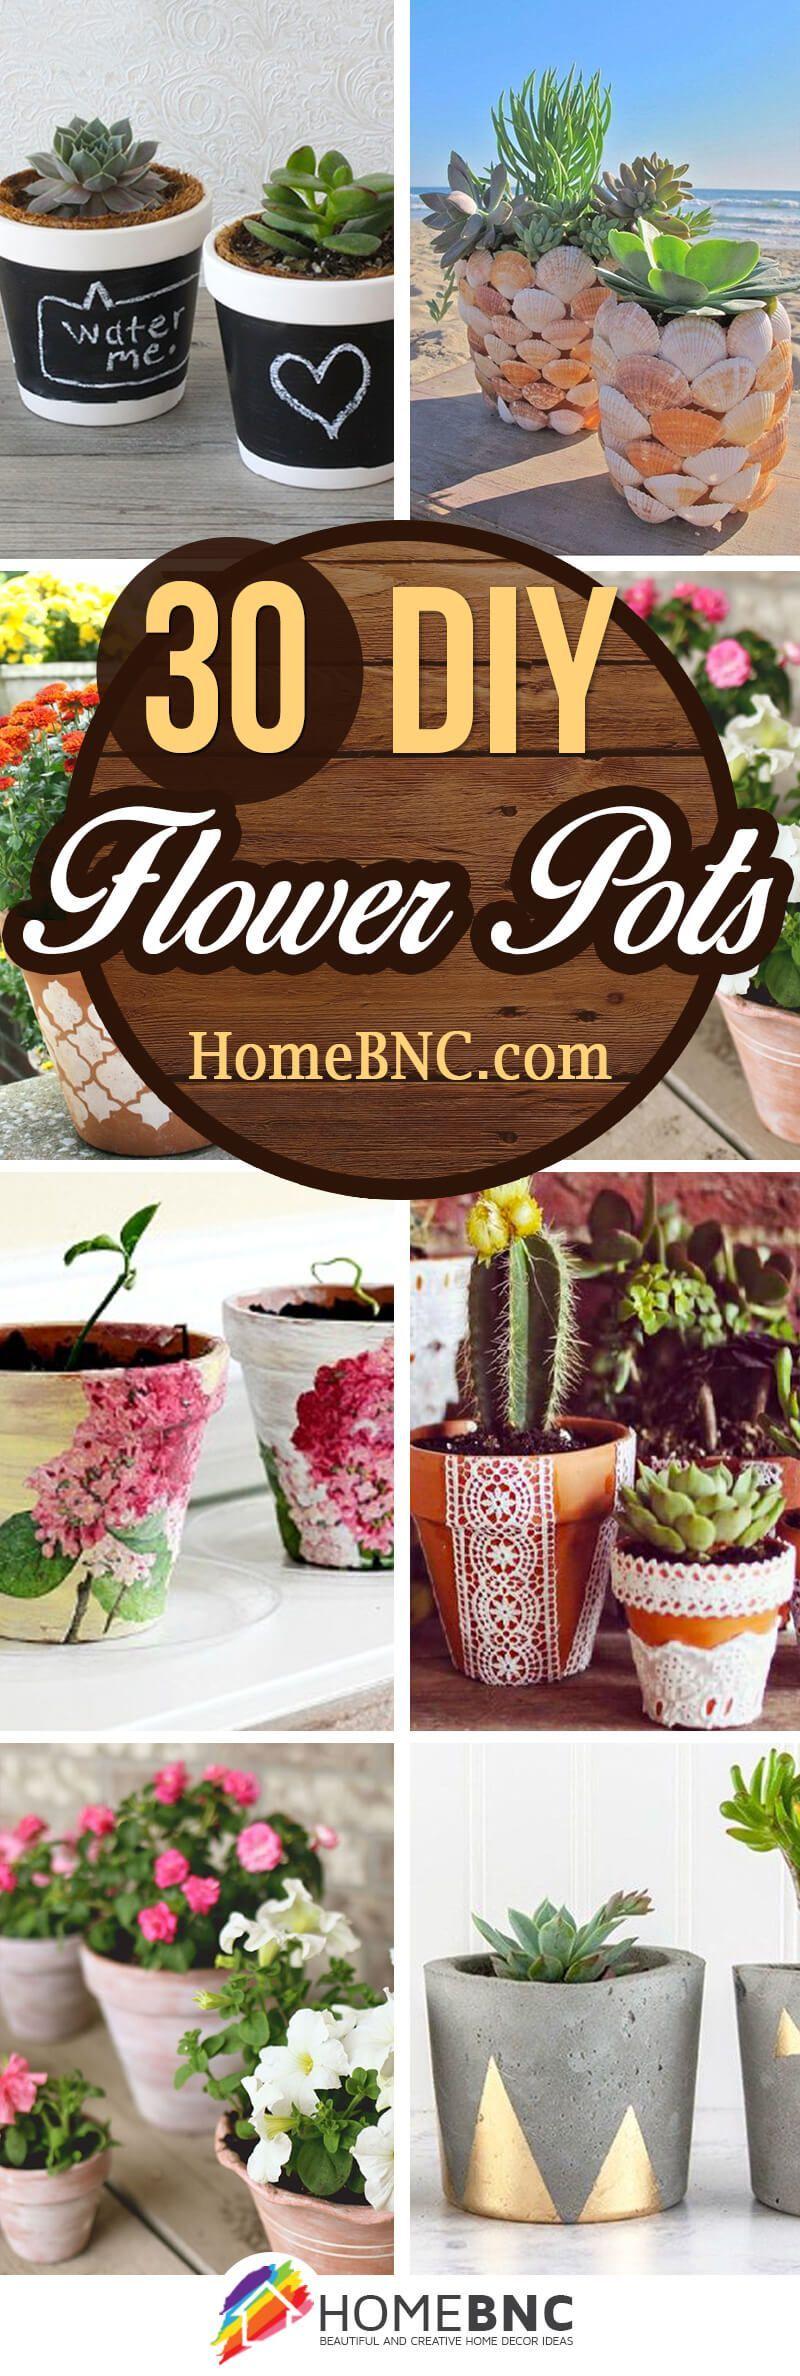 30 fresh as a daisy diy flower pot ideas for stylish